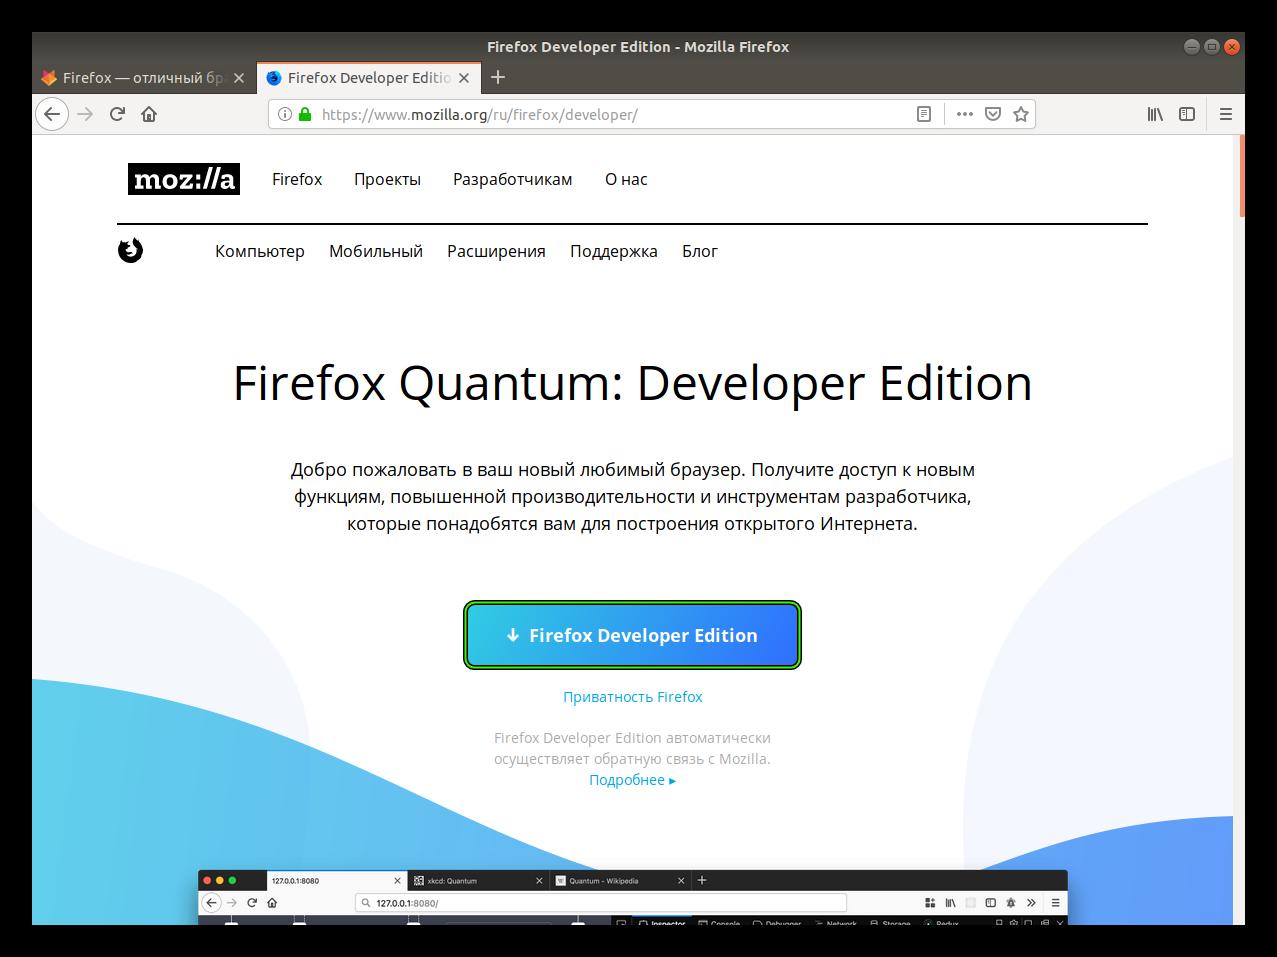 Skachat-Firefox-Developer-Edition-dlya-Linux.png